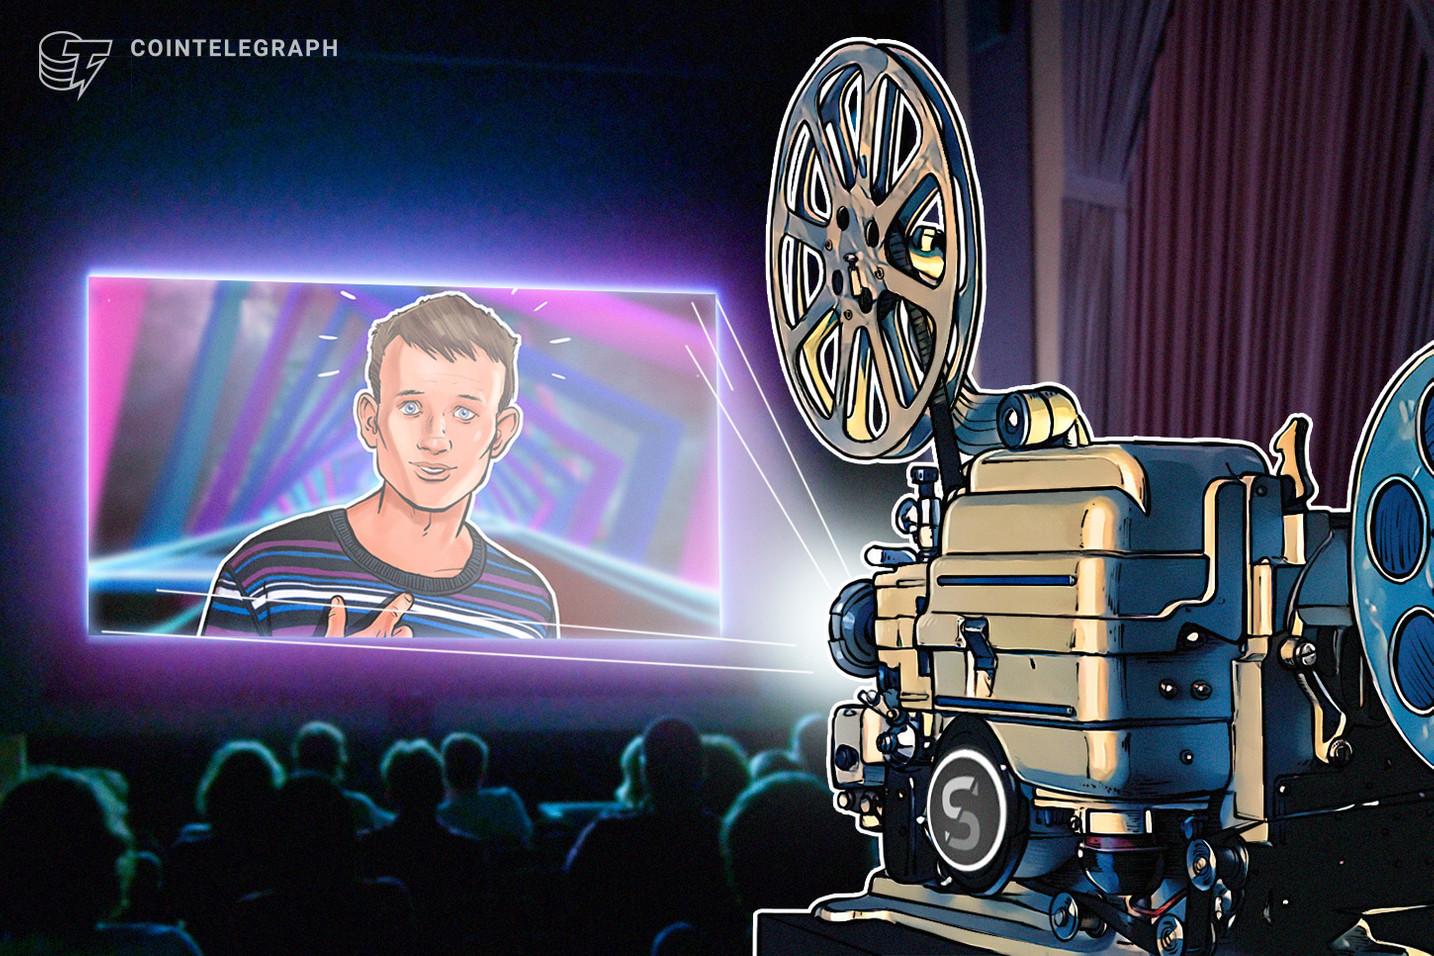 Ethereum documentary featuring Vitalik Buterin raises $1.9M in 3 days